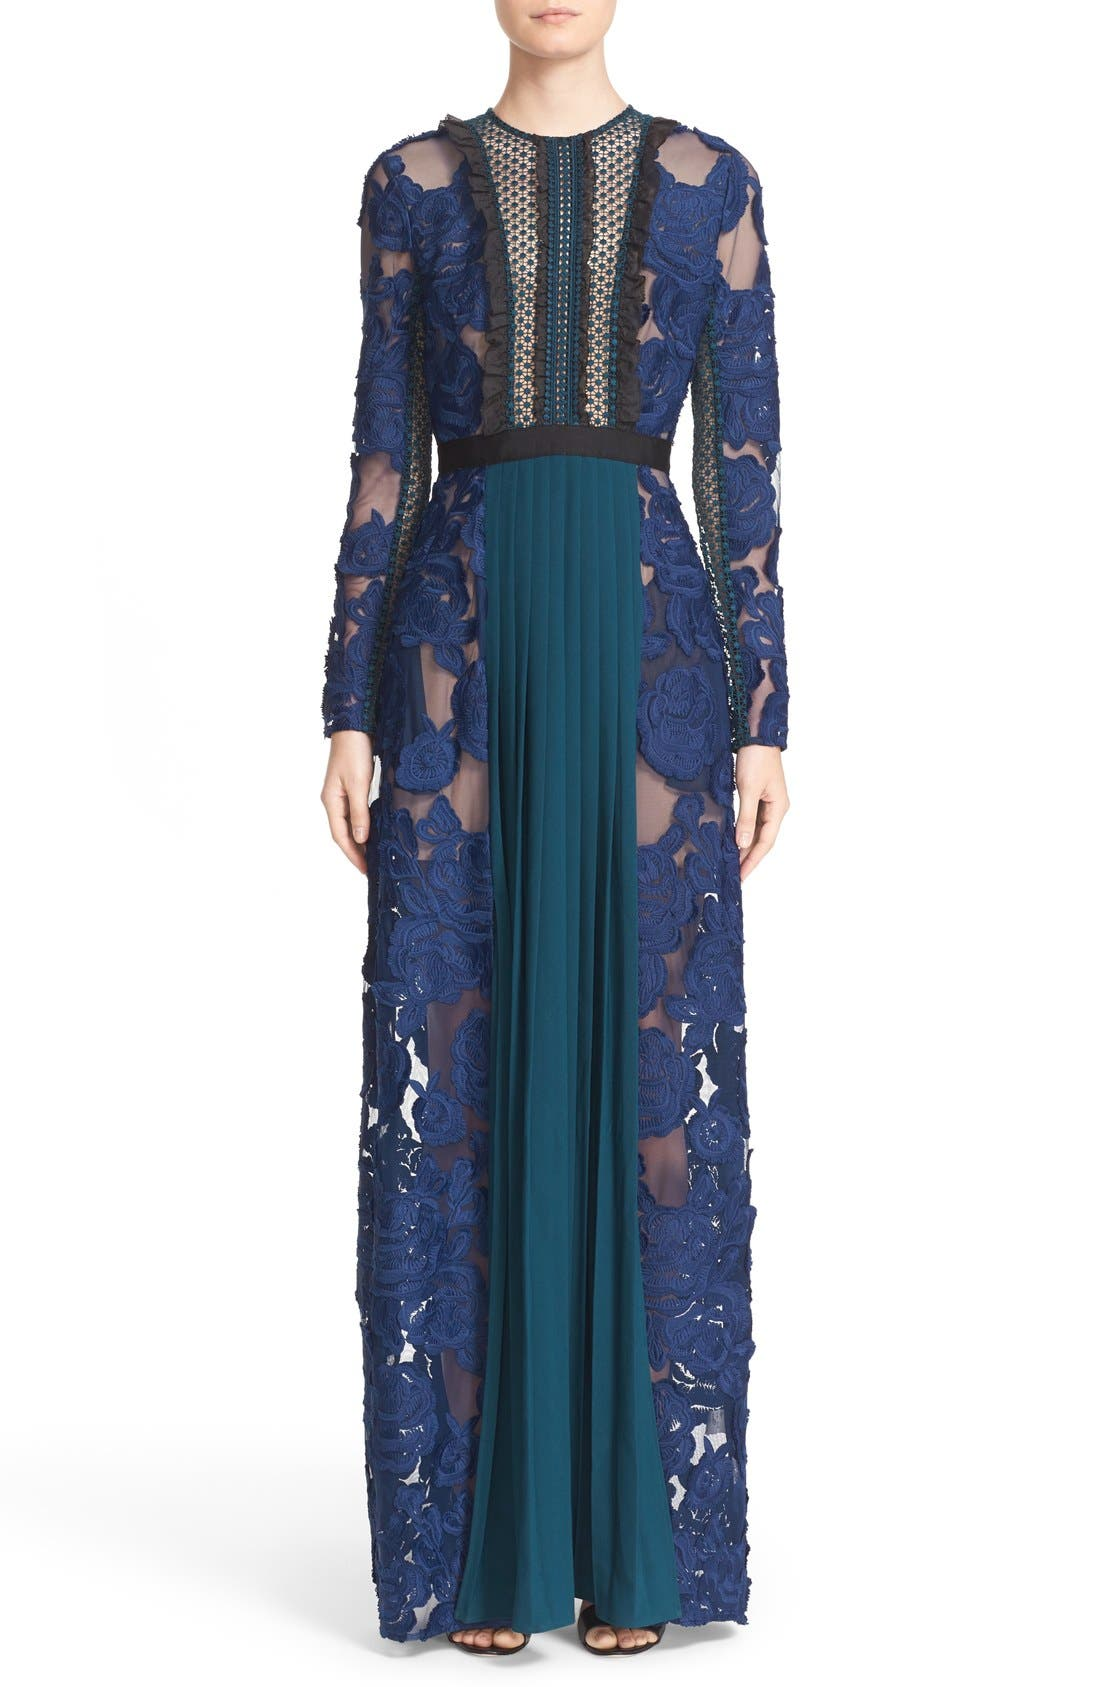 Alternate Image 1 Selected - Self-Portrait 'Thea' Lace & Crepe Maxi Dress